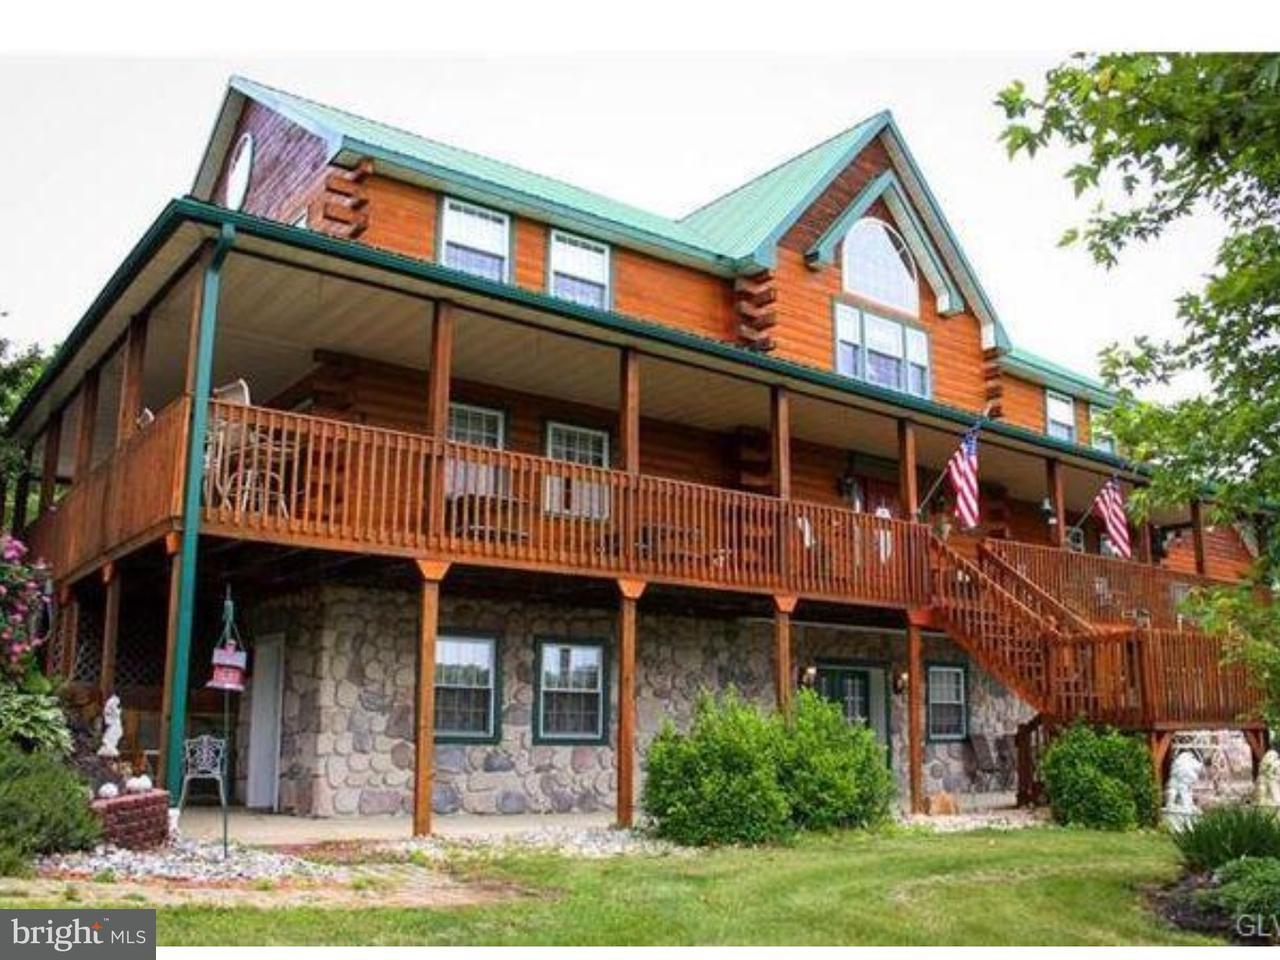 Single Family Home for Sale at 115 MOORE Road Lebanon, Pennsylvania 17046 United States